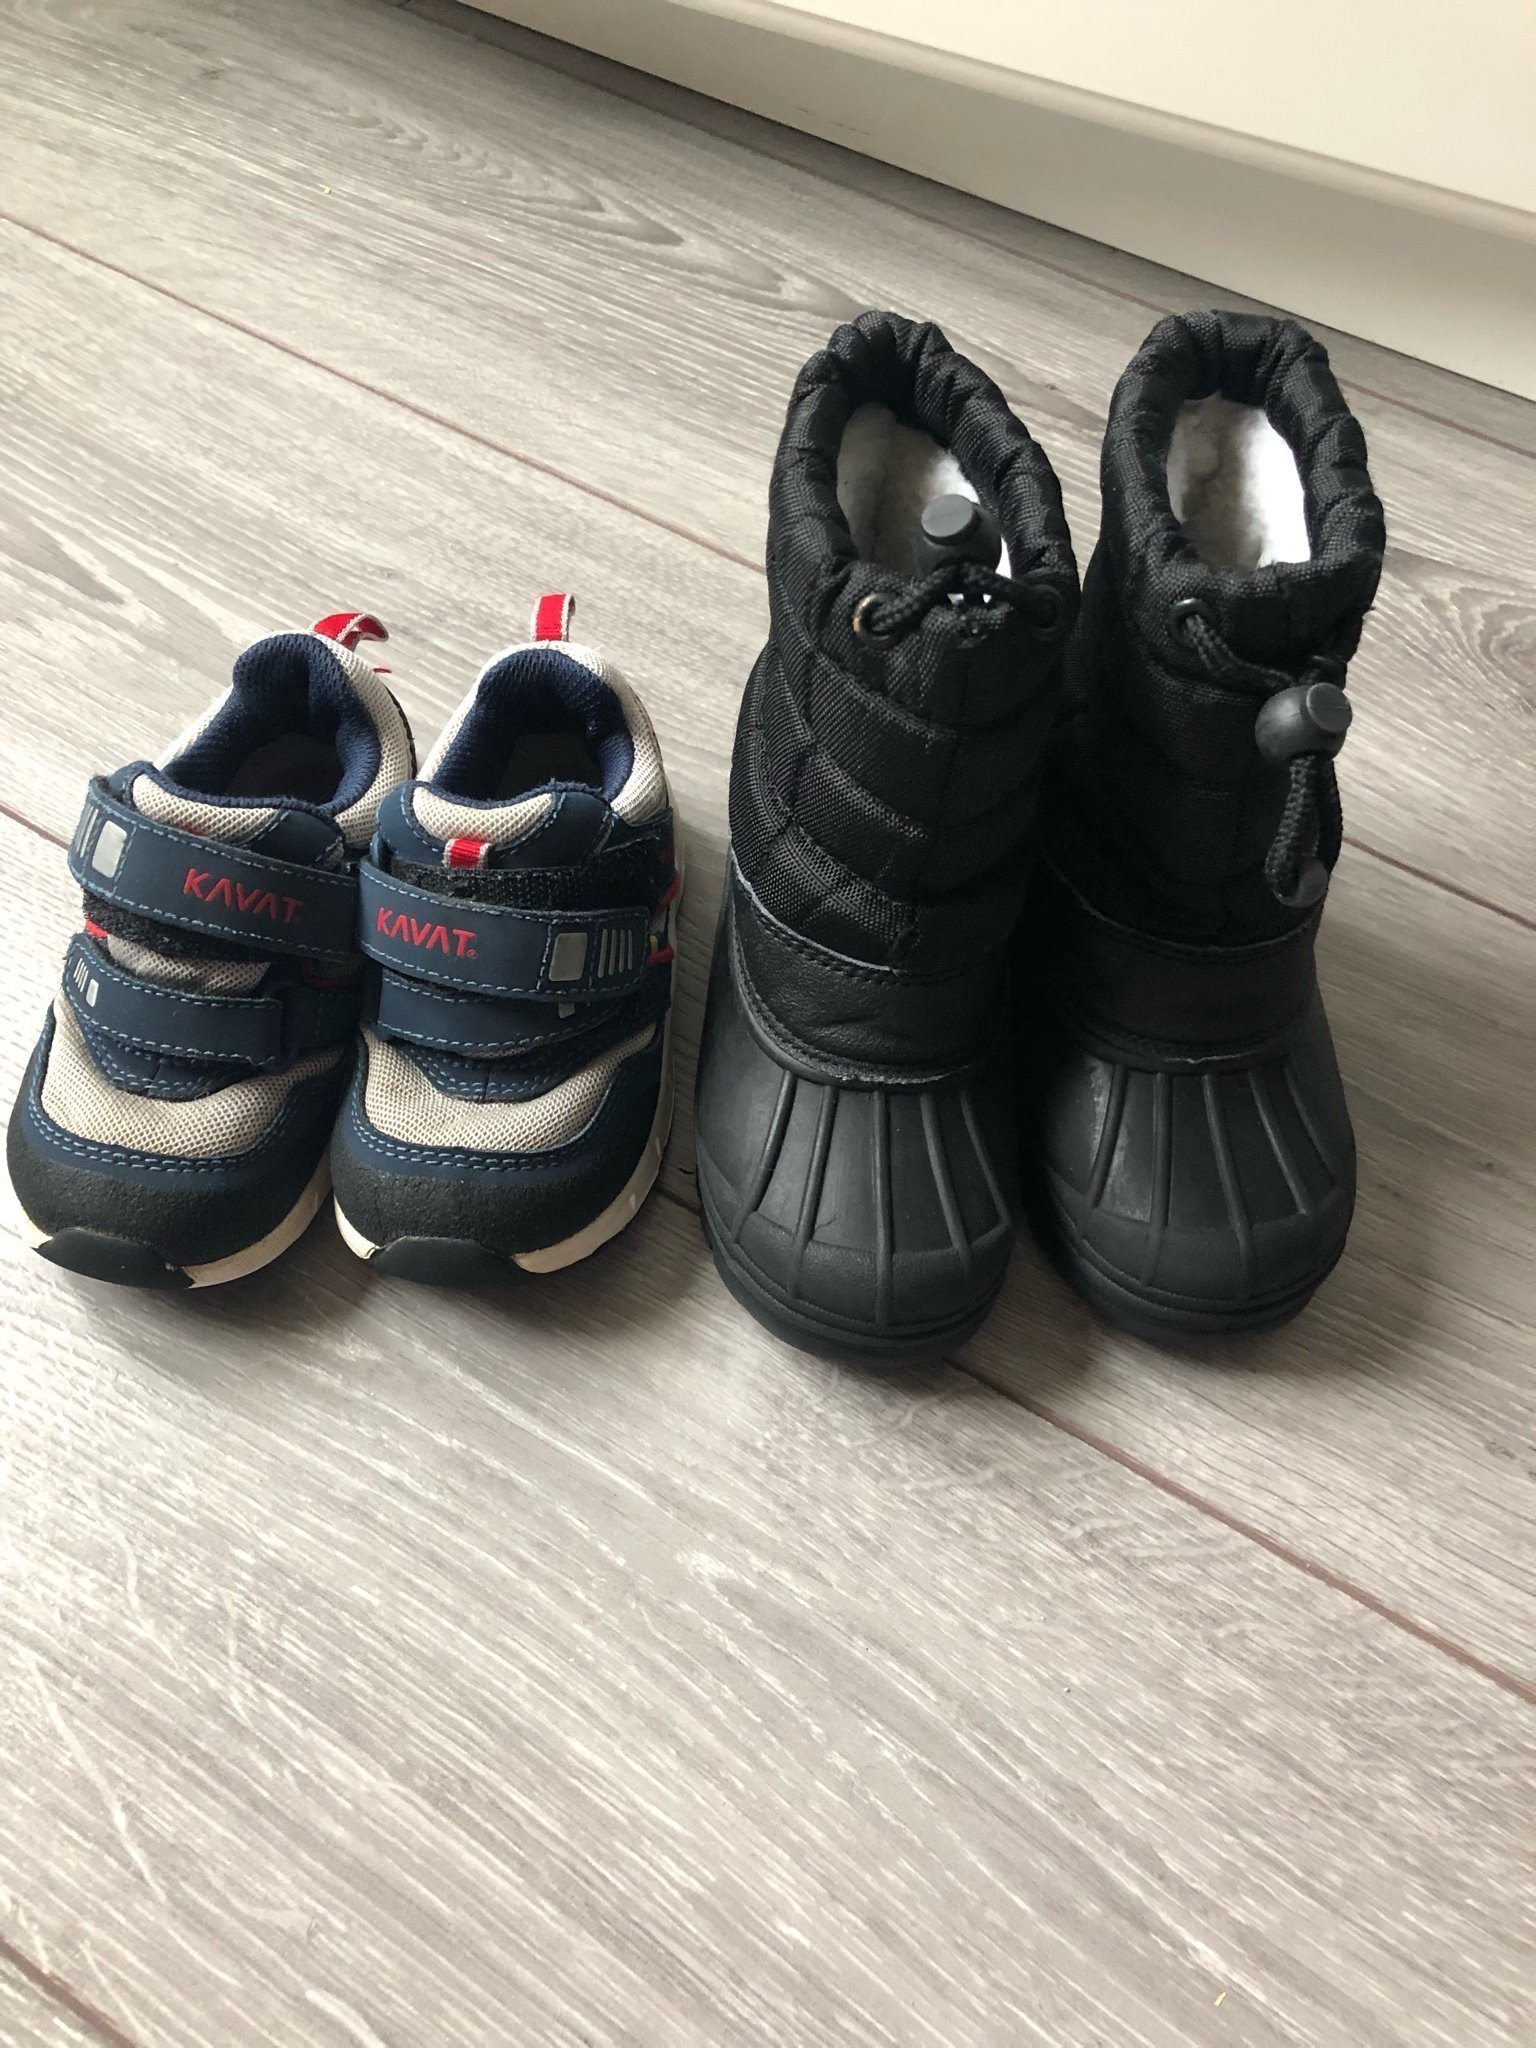 purchase cheap 8c667 fc877 Barn skor. Kavat storlek 23, MyWear storlek 24.